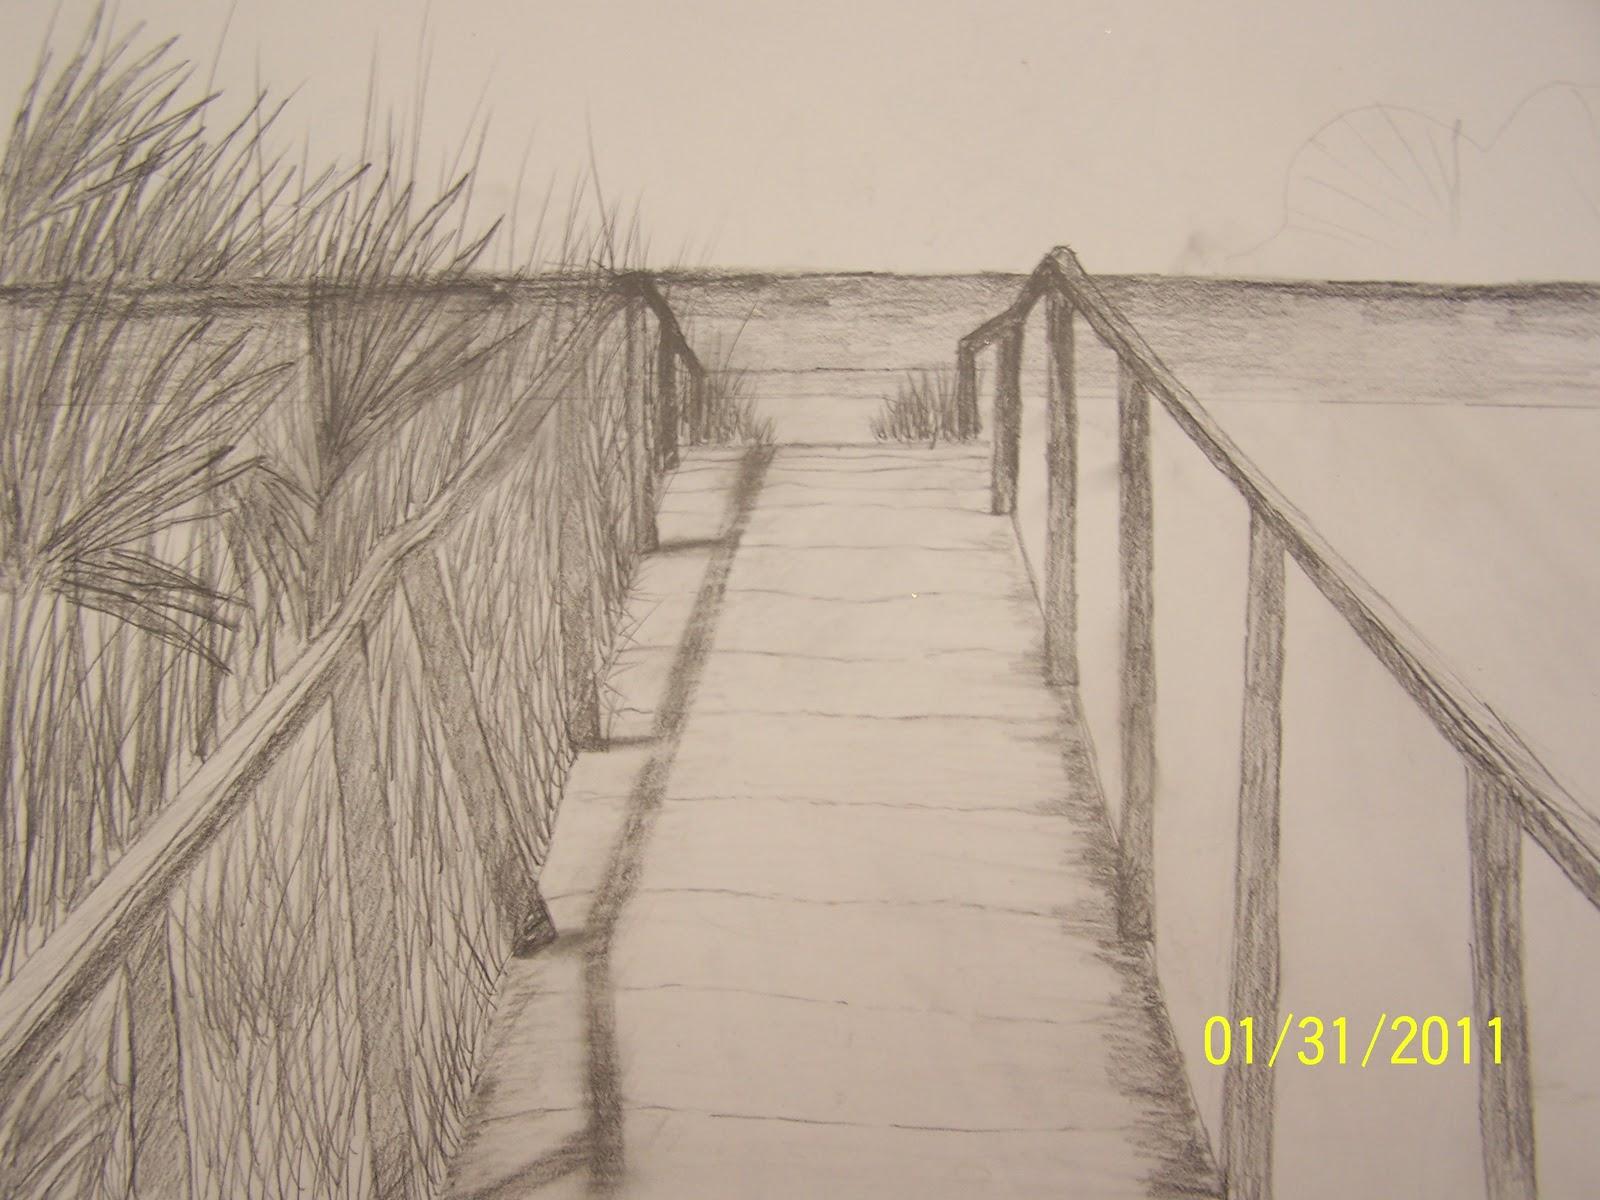 Elementary Artist: Sketching of my own